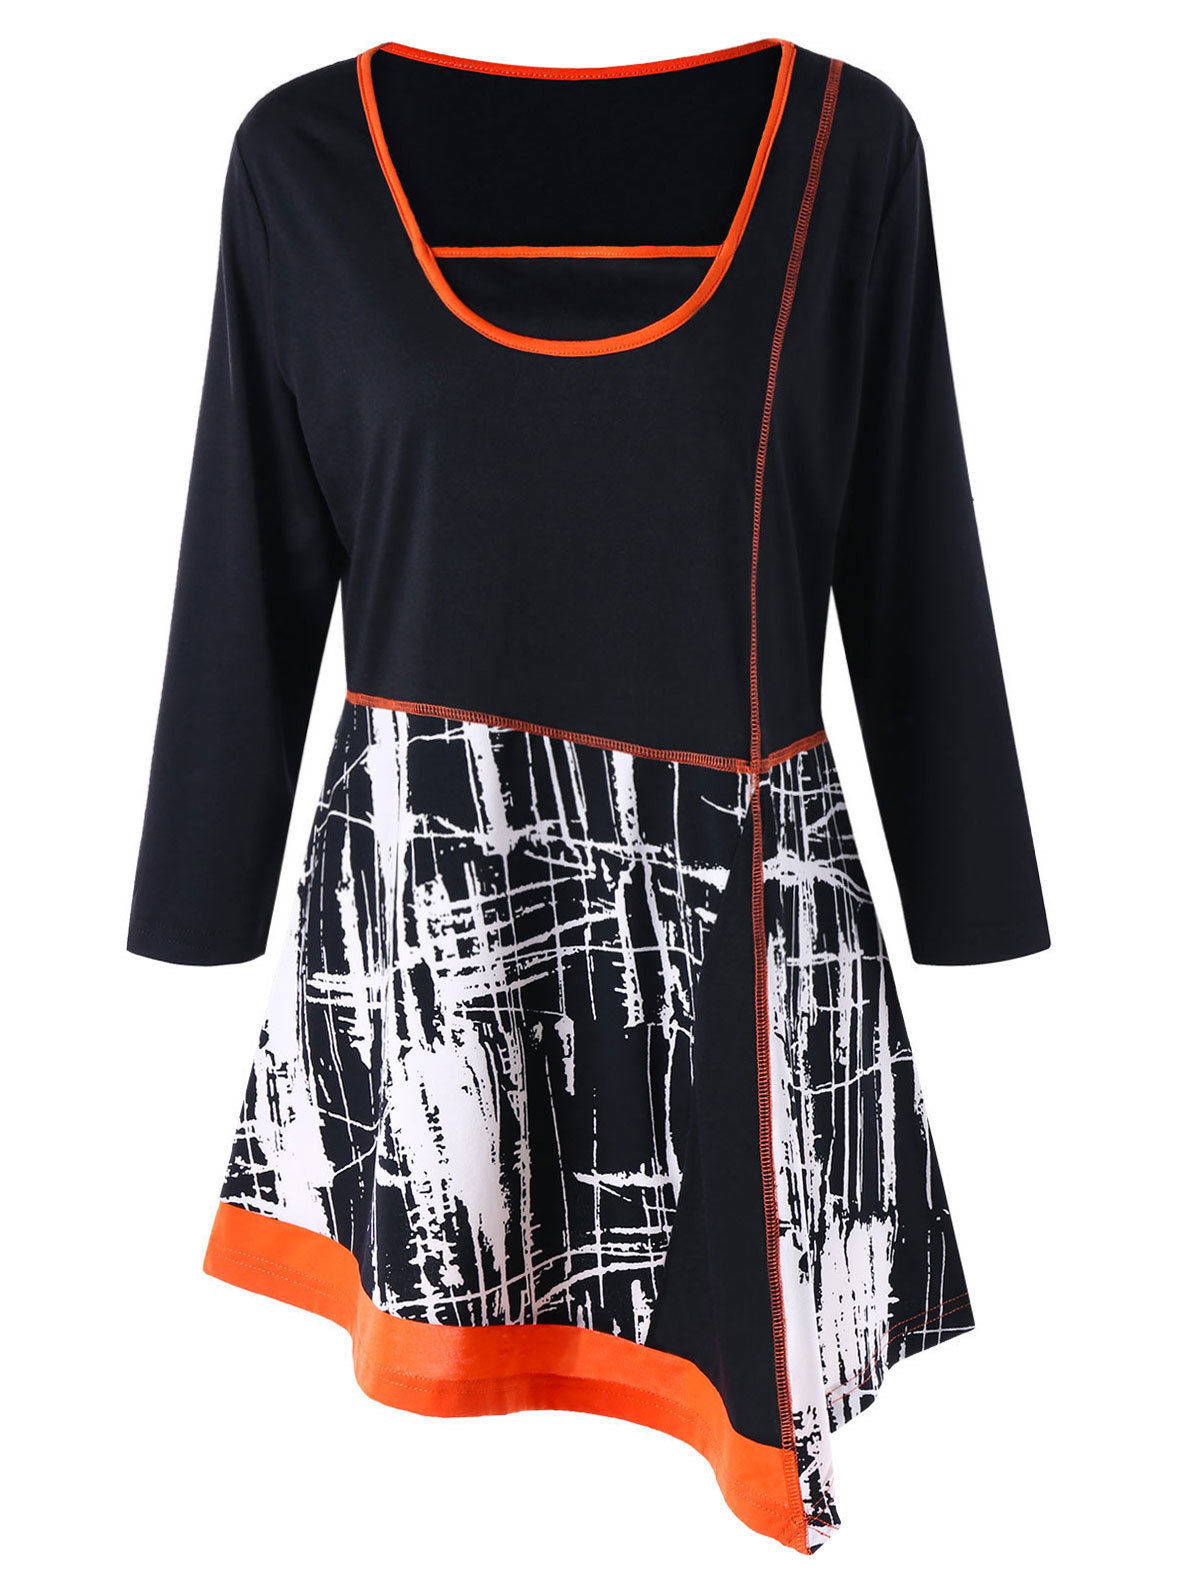 967f23c7afdfa5  9.99 - Plus Size Xl-5Xl Women T-Shirt Blouse Tops Print Asymmetric Ringer Long  Sleeve  ebay  Fashion